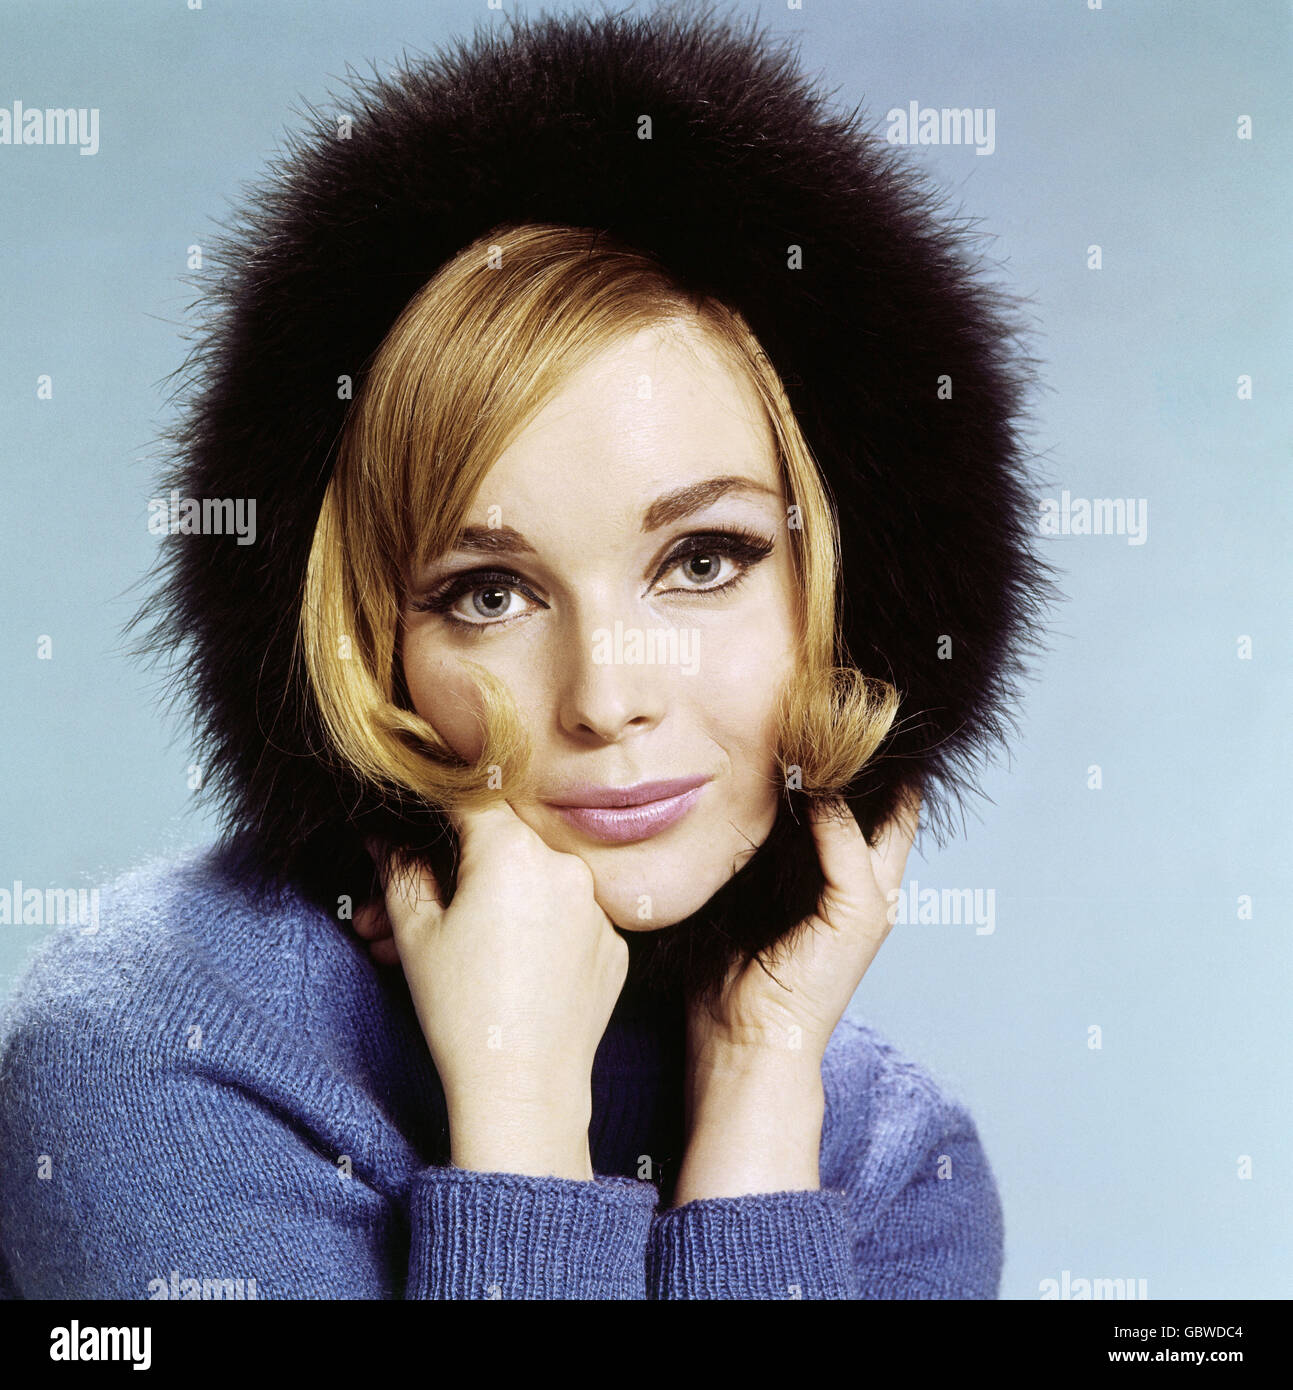 Moda, 1960, accesorios, gorras, mujer vistiendo pieles, cap-Clearences Additional-Rights-NA Imagen De Stock